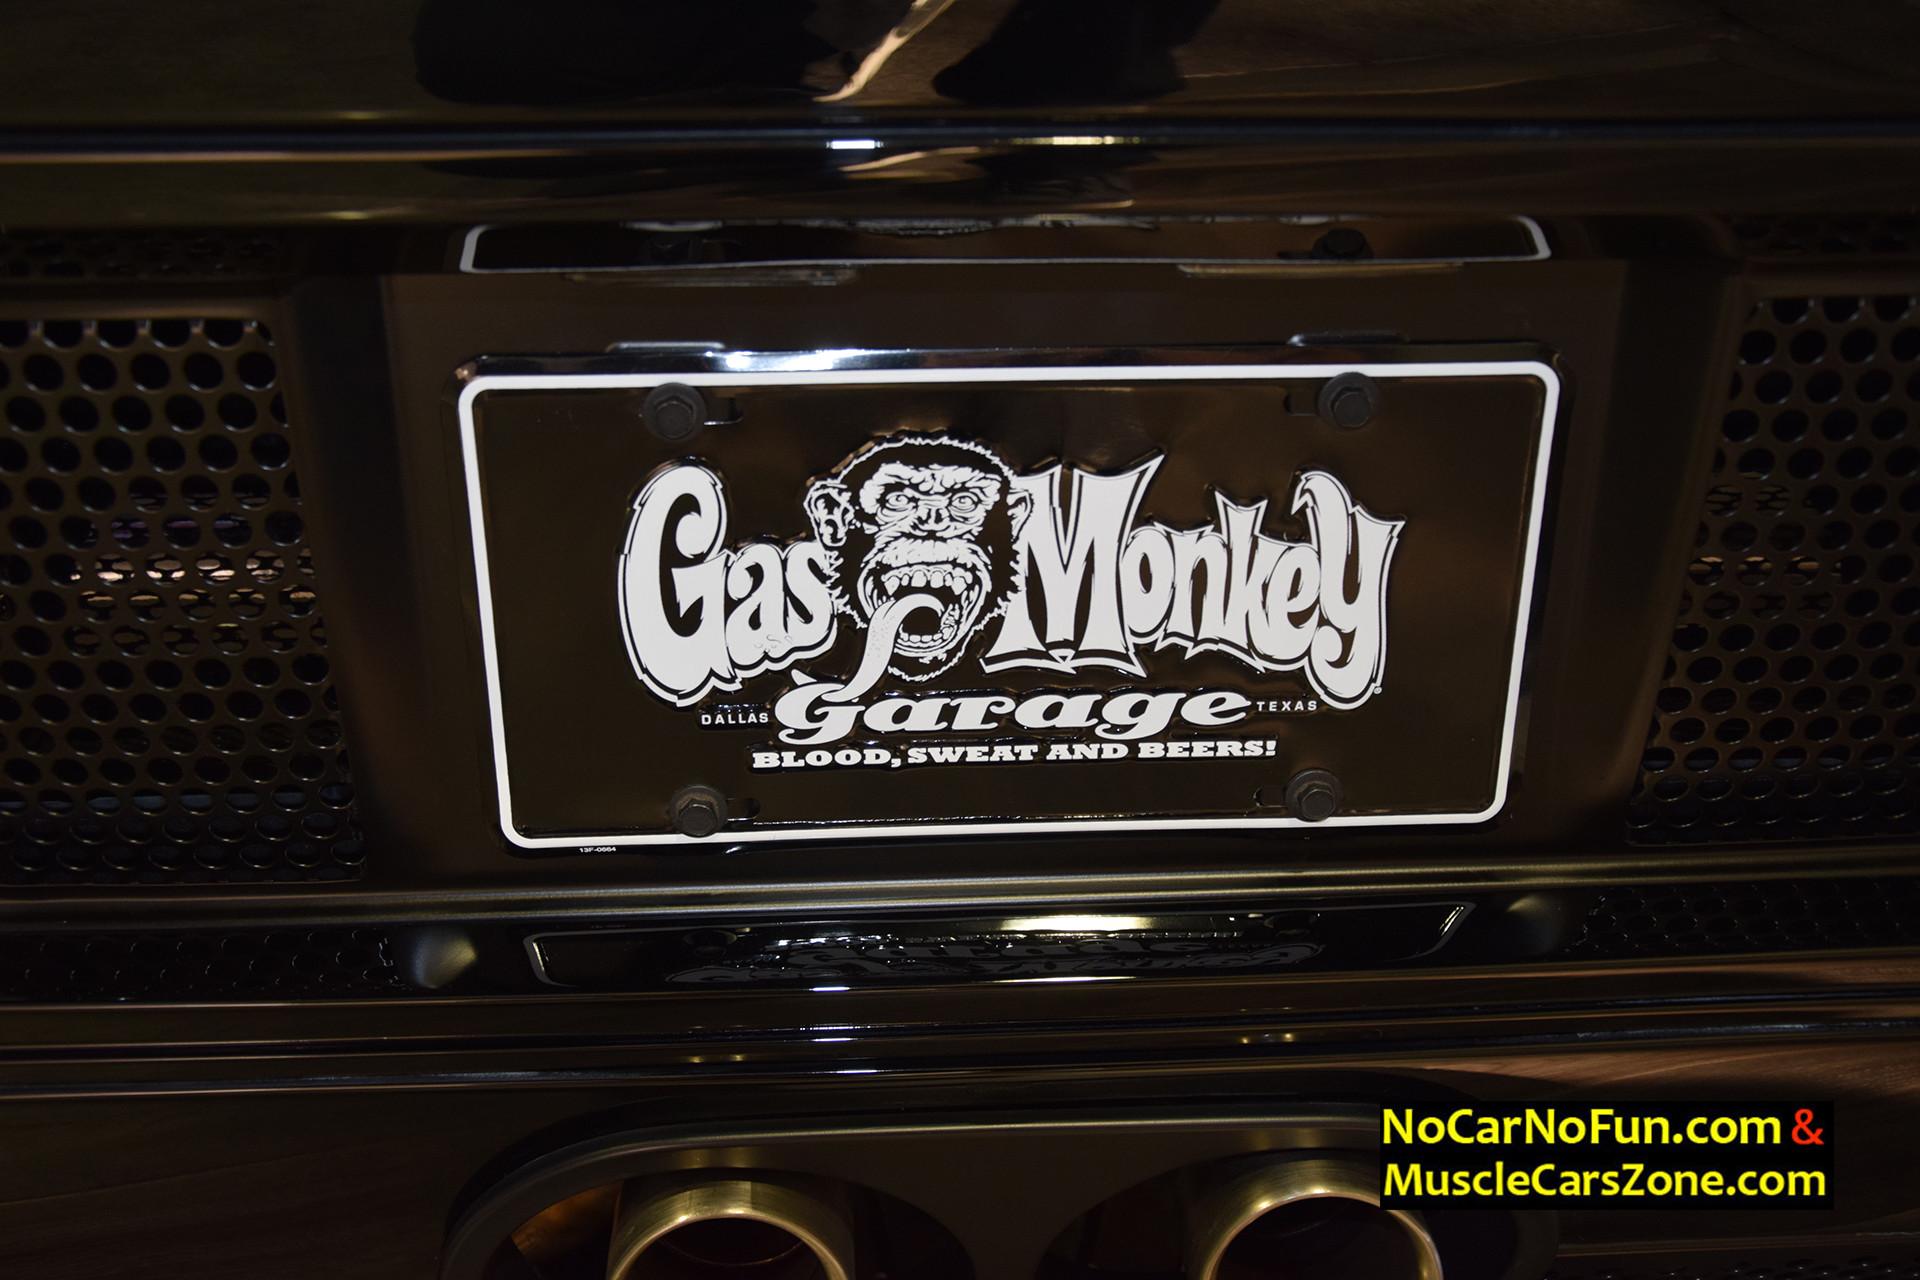 Gas monkey truck monkey gas monkey garage logo gas monkey logo gas –  Classic Ford Gt